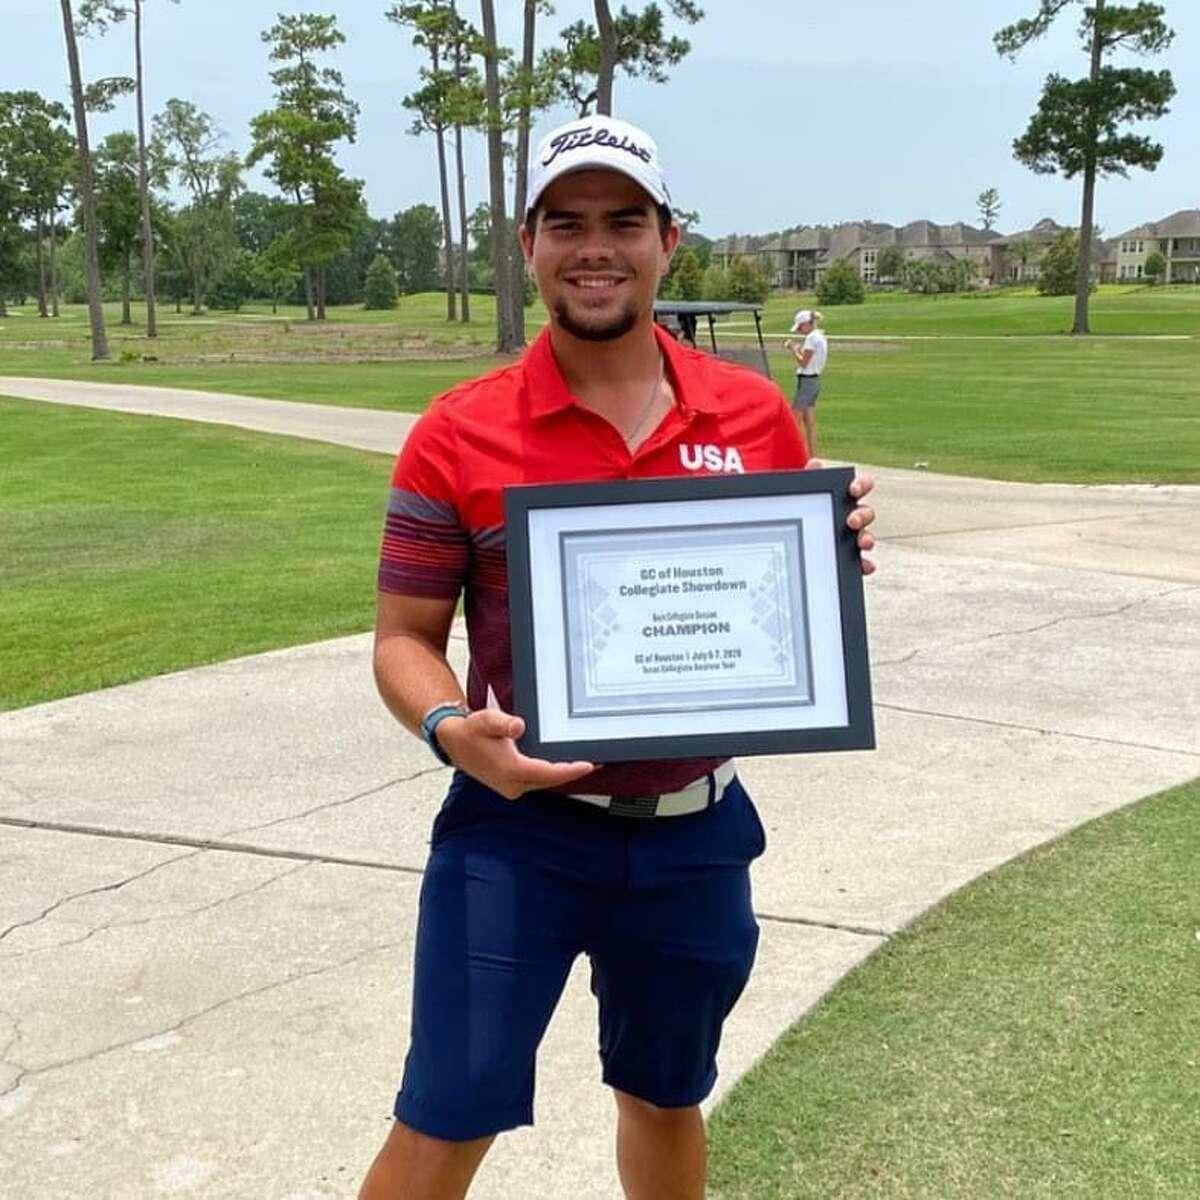 UTSA golfer and Montgomery High School alum Hunter Bott won the Golf Club Houston Showcase, a tournament put on by the Texas Collegiate Amateur Tournament, at Golf Club of Houston on Tuesday, July 7, 2020.